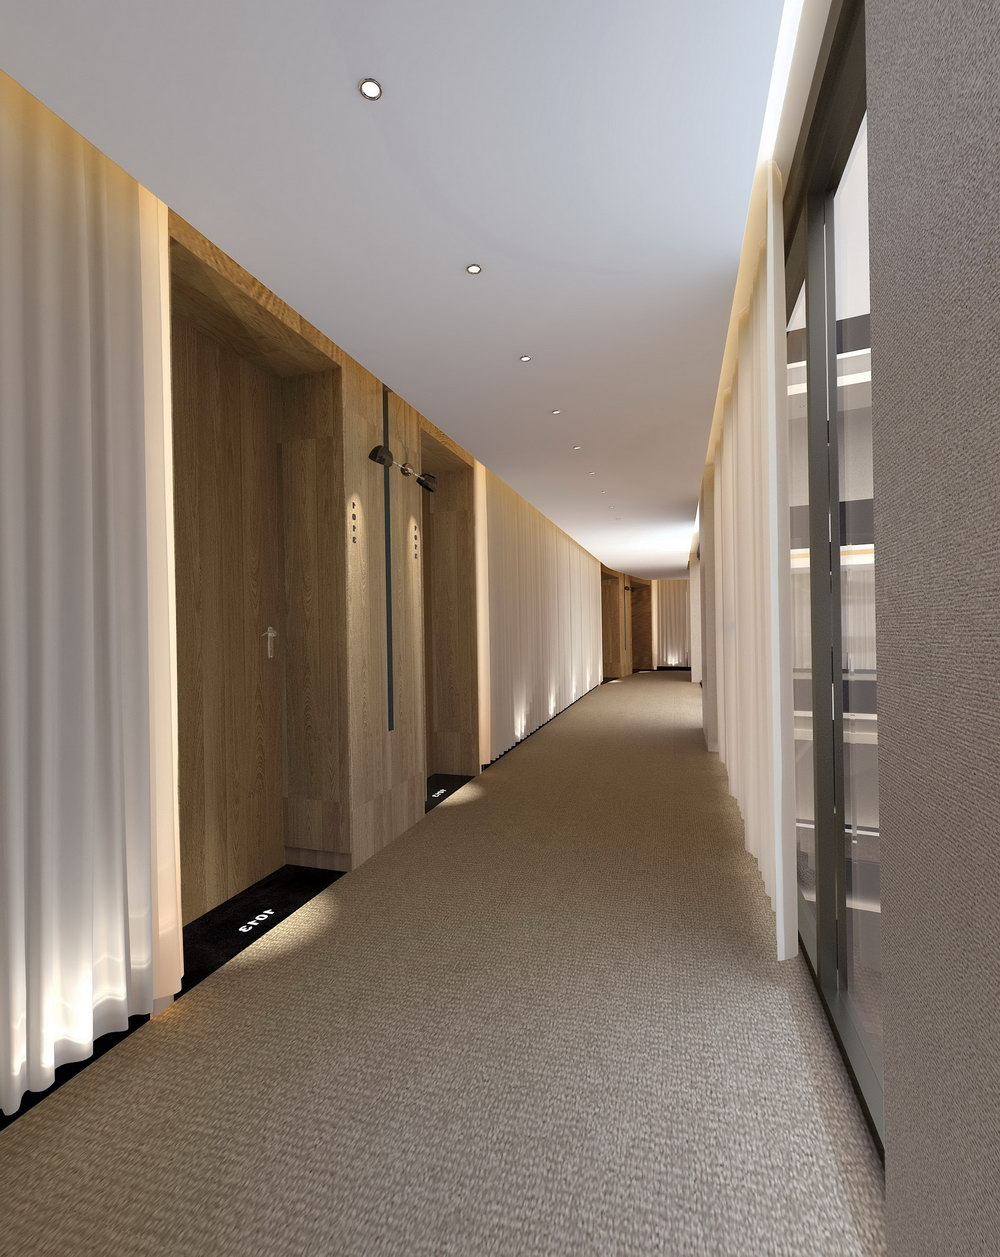 Install Closet Doors Before Or After Carpet